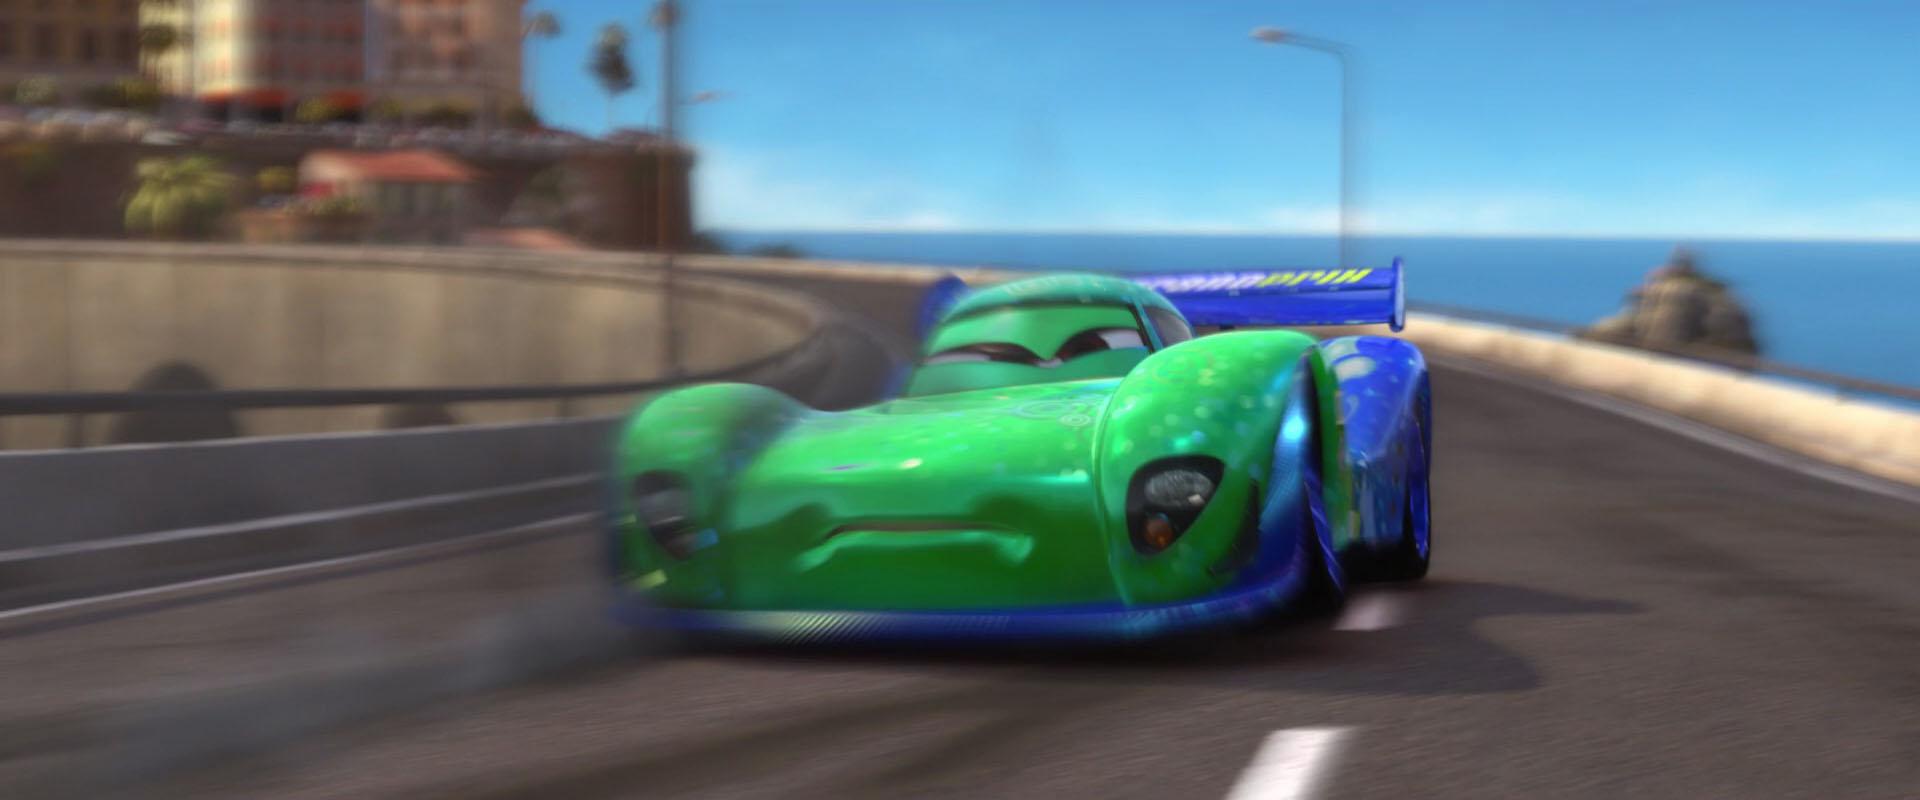 carla-veloso-personnage-cars-2-02